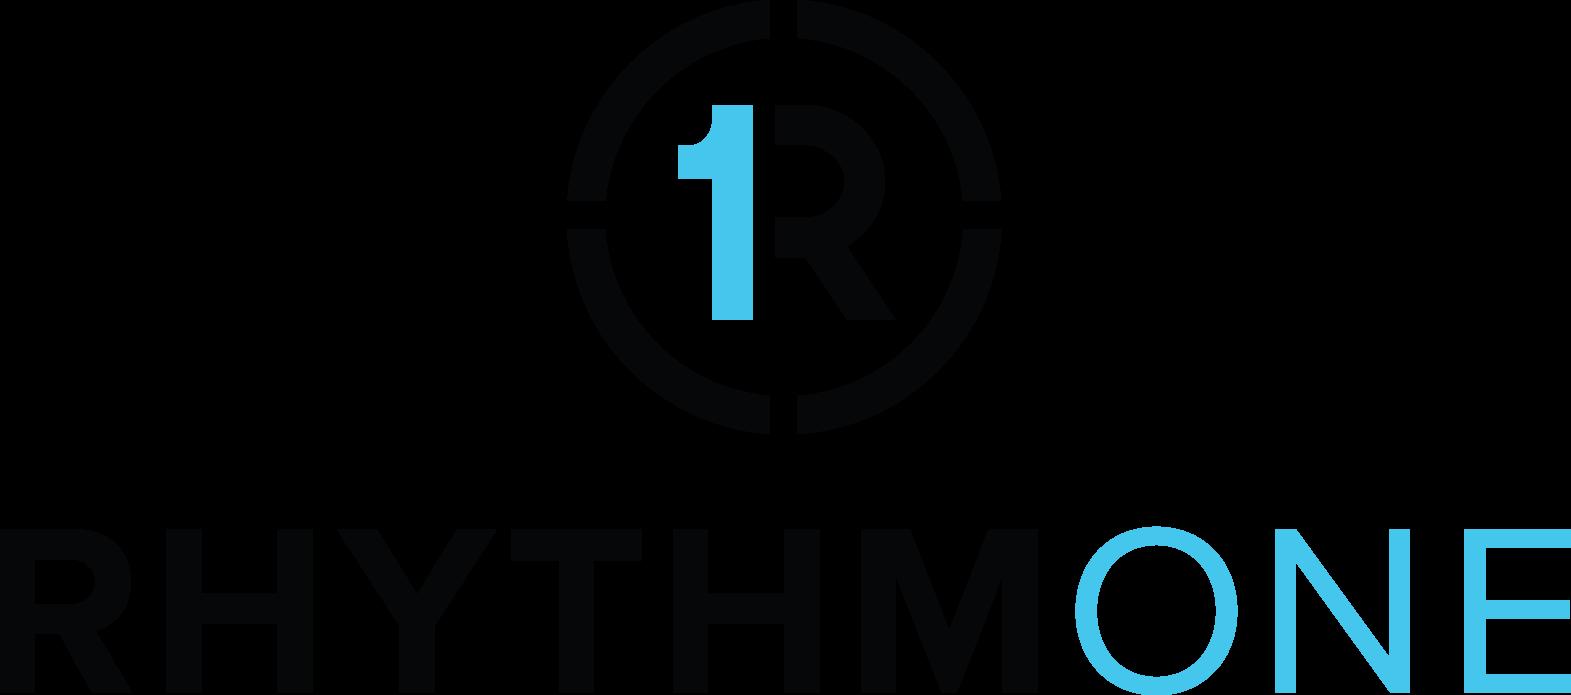 R1_Logo_Stacked_CMYK_.png